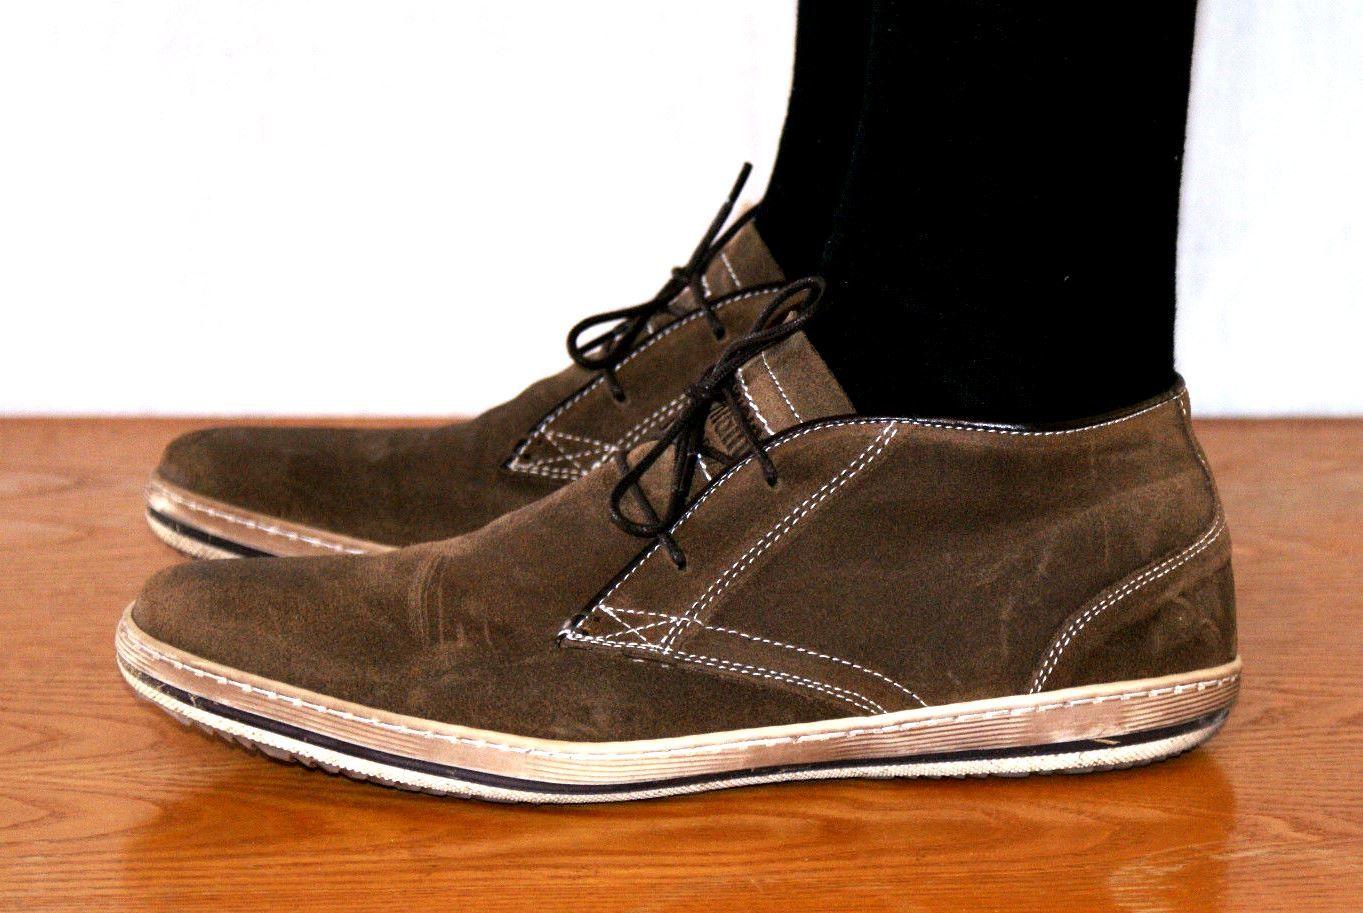 Wonderful Suede Sneaker Man Shoes US Size 9 Branded ZIGN